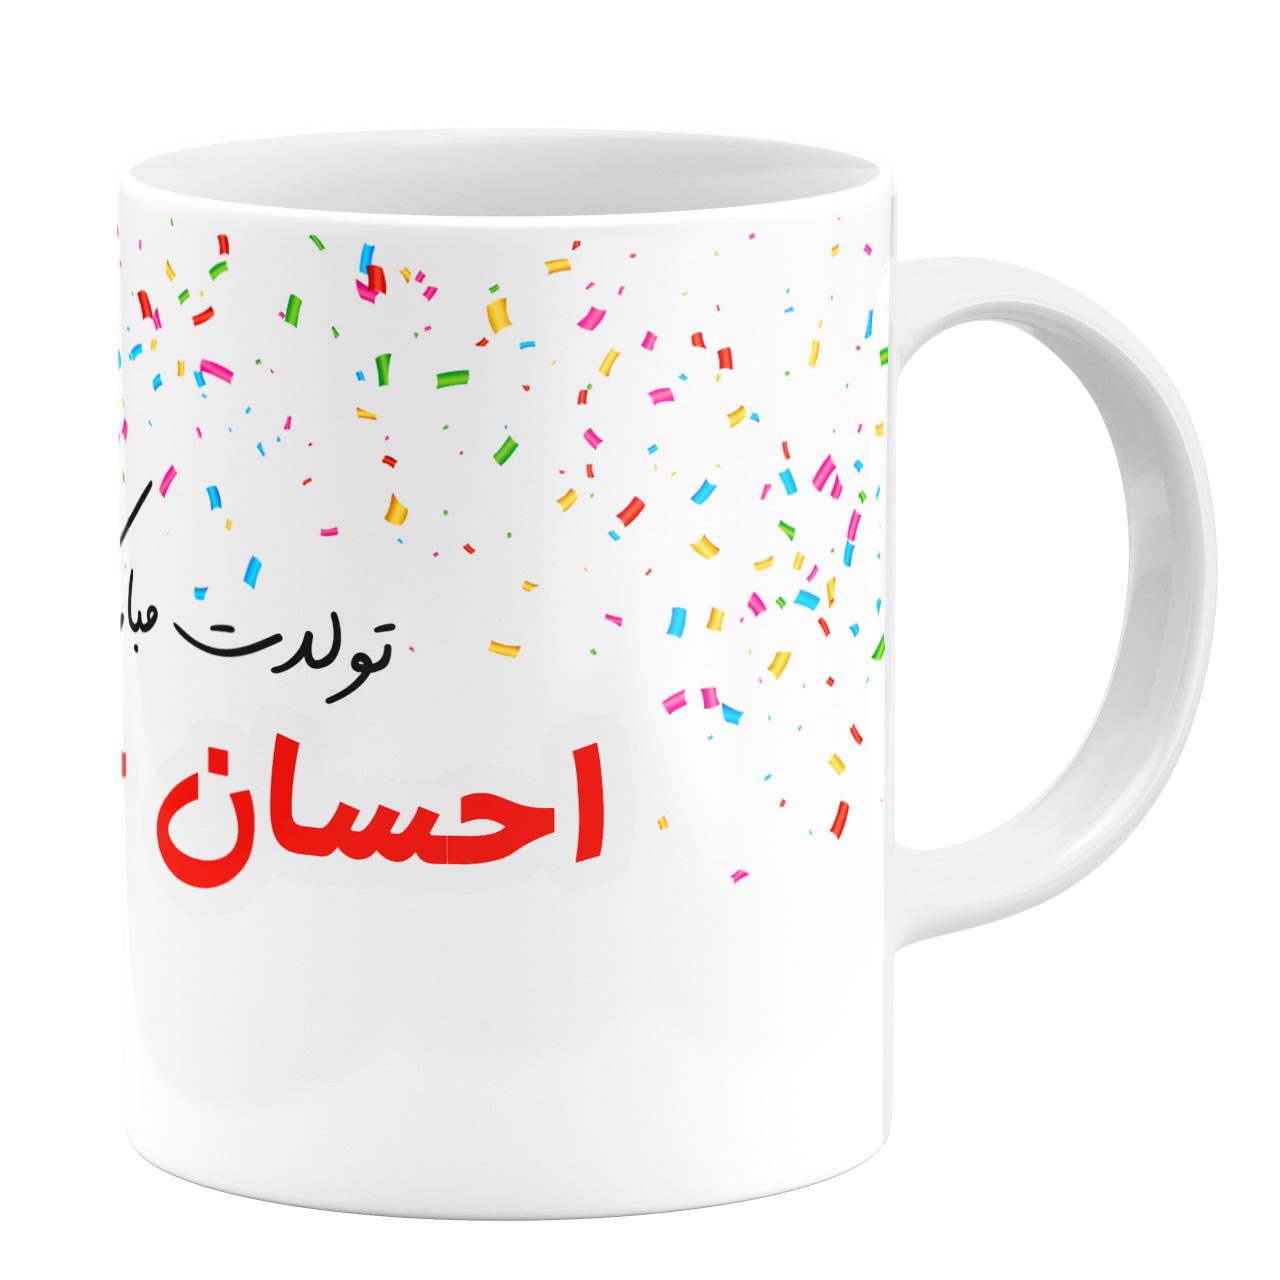 عکس ماگ طرح تولد احسان کد 11054094007